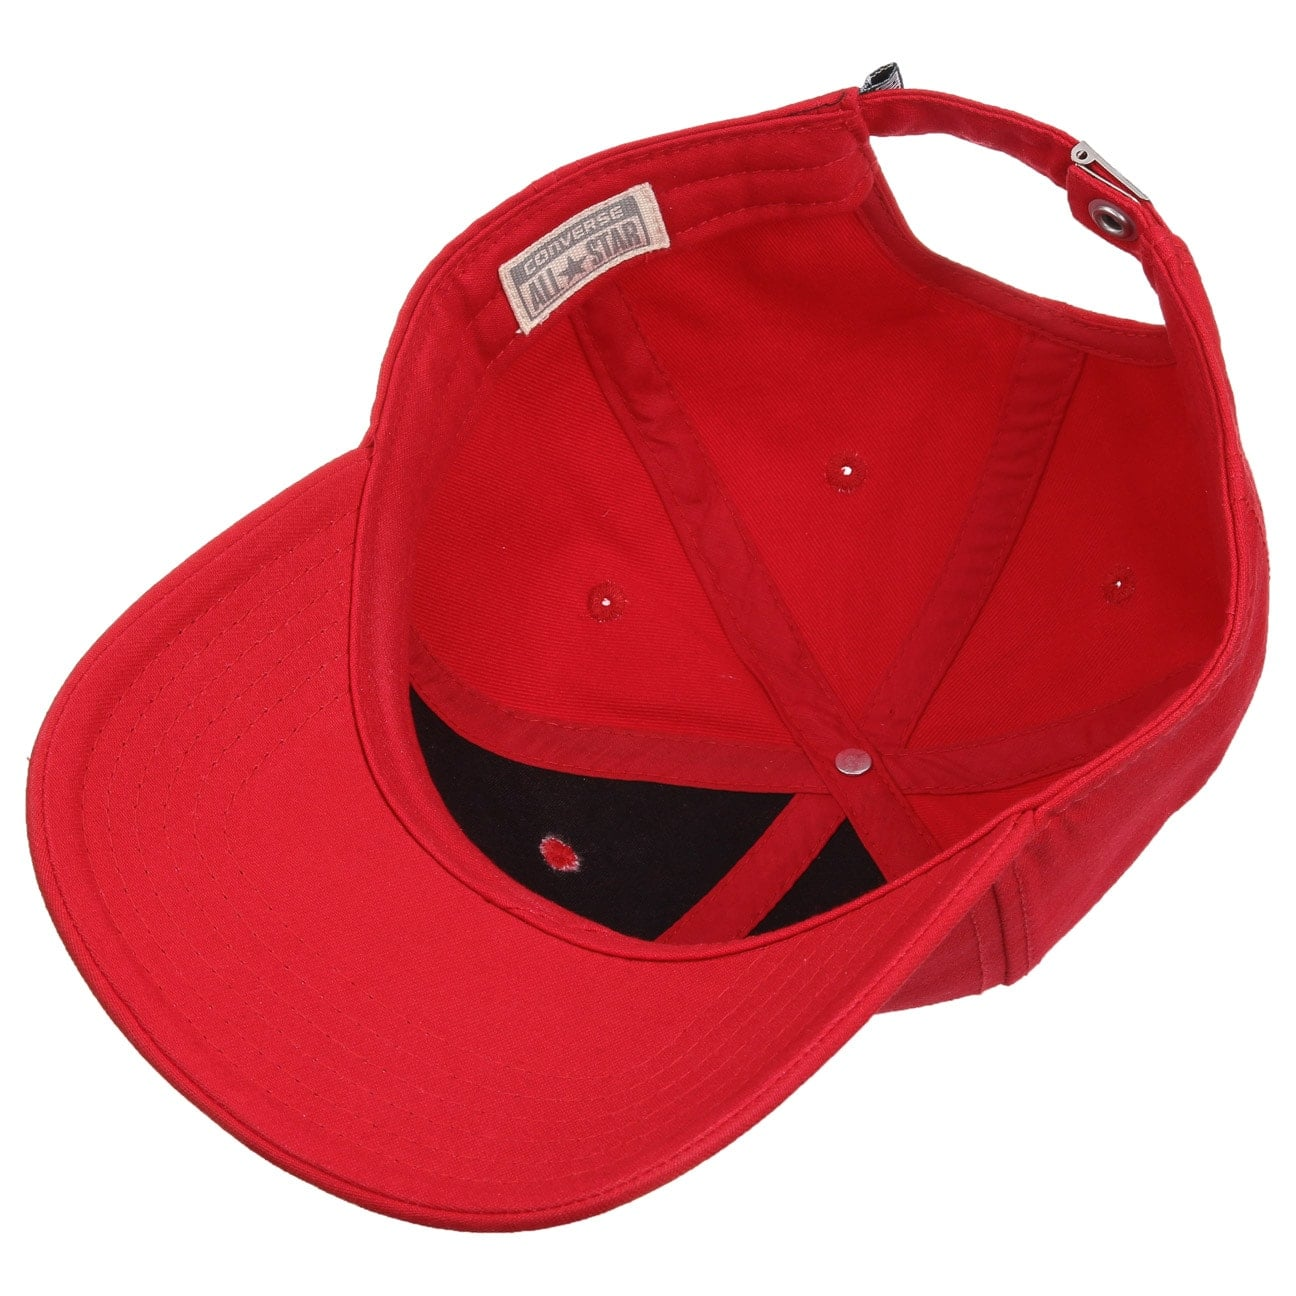 Core Classic Baseball Cap by Converse - Gorras - sombreroshop.es 5face3def2d